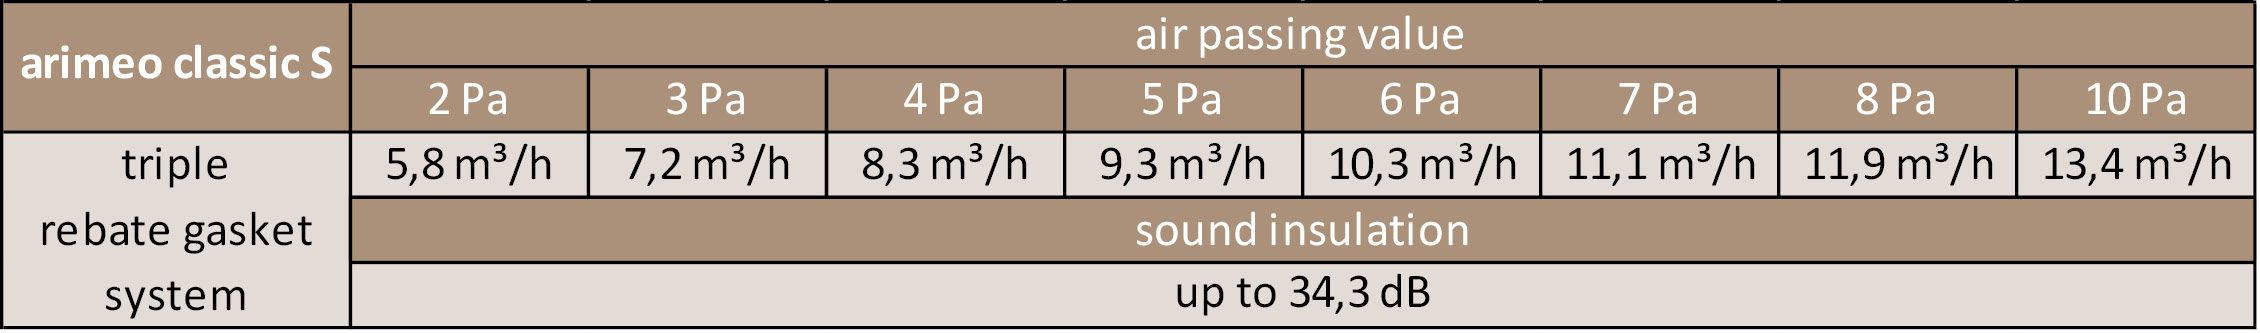 arimeo classic S performance data triple